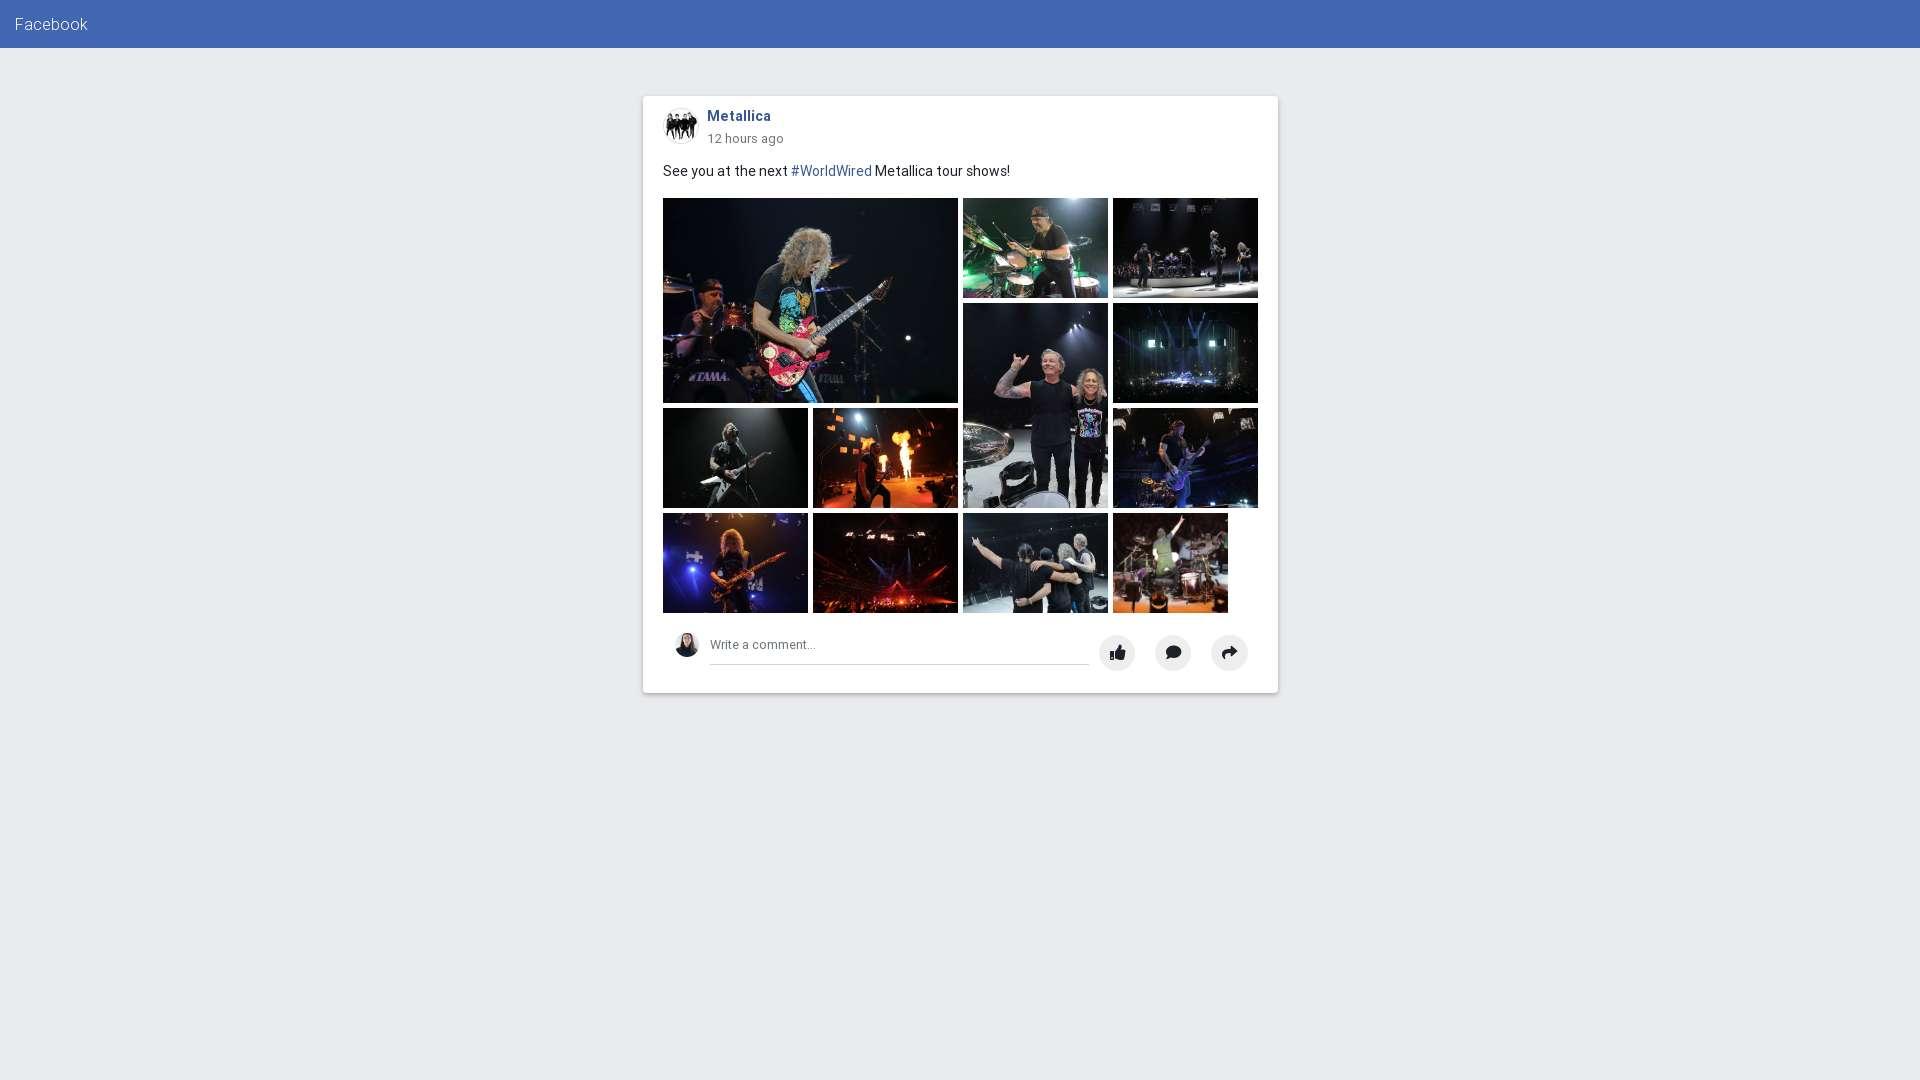 Facebook style gallery